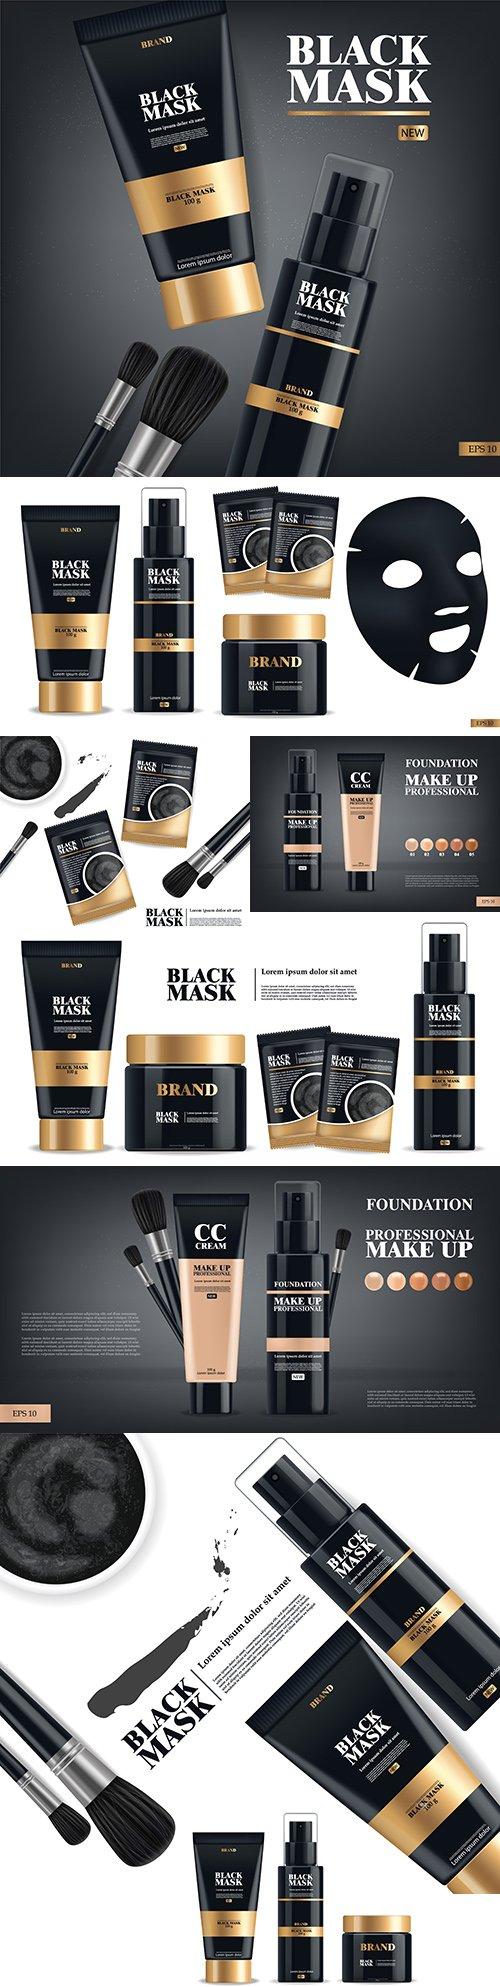 Realistic black mask and tonal makeup cream